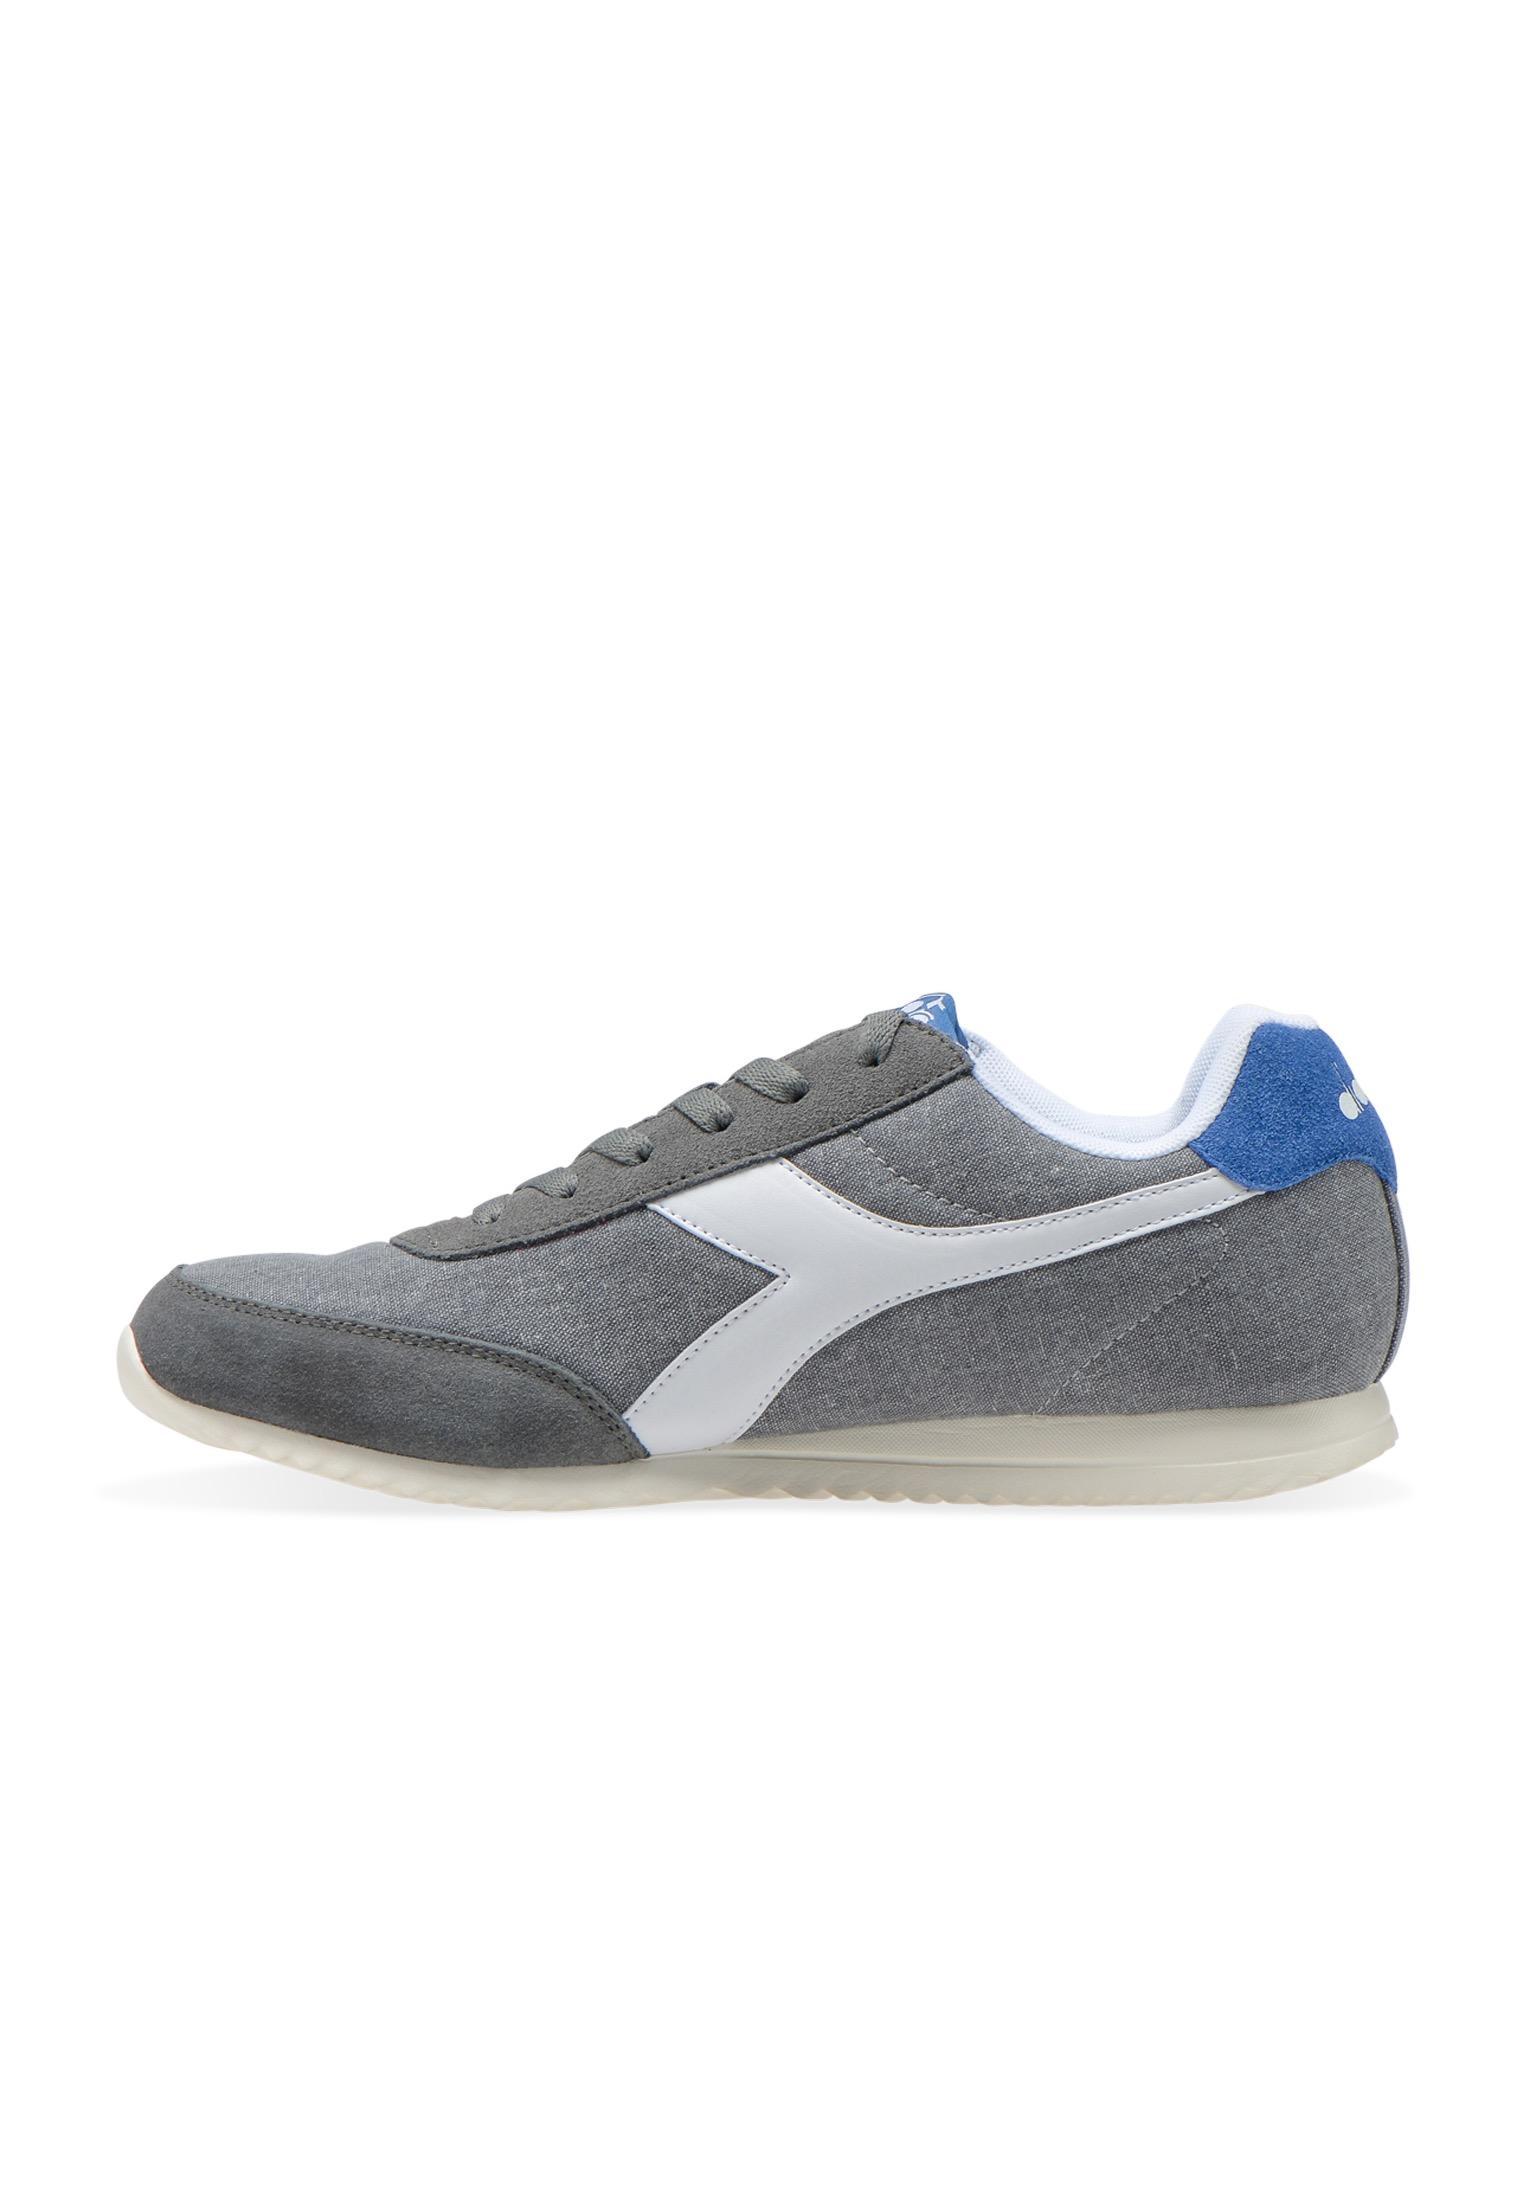 Scarpe-Diadora-Jog-Light-C-Sneakers-sportive-uomo-donna-vari-colori-e-taglie miniatura 69